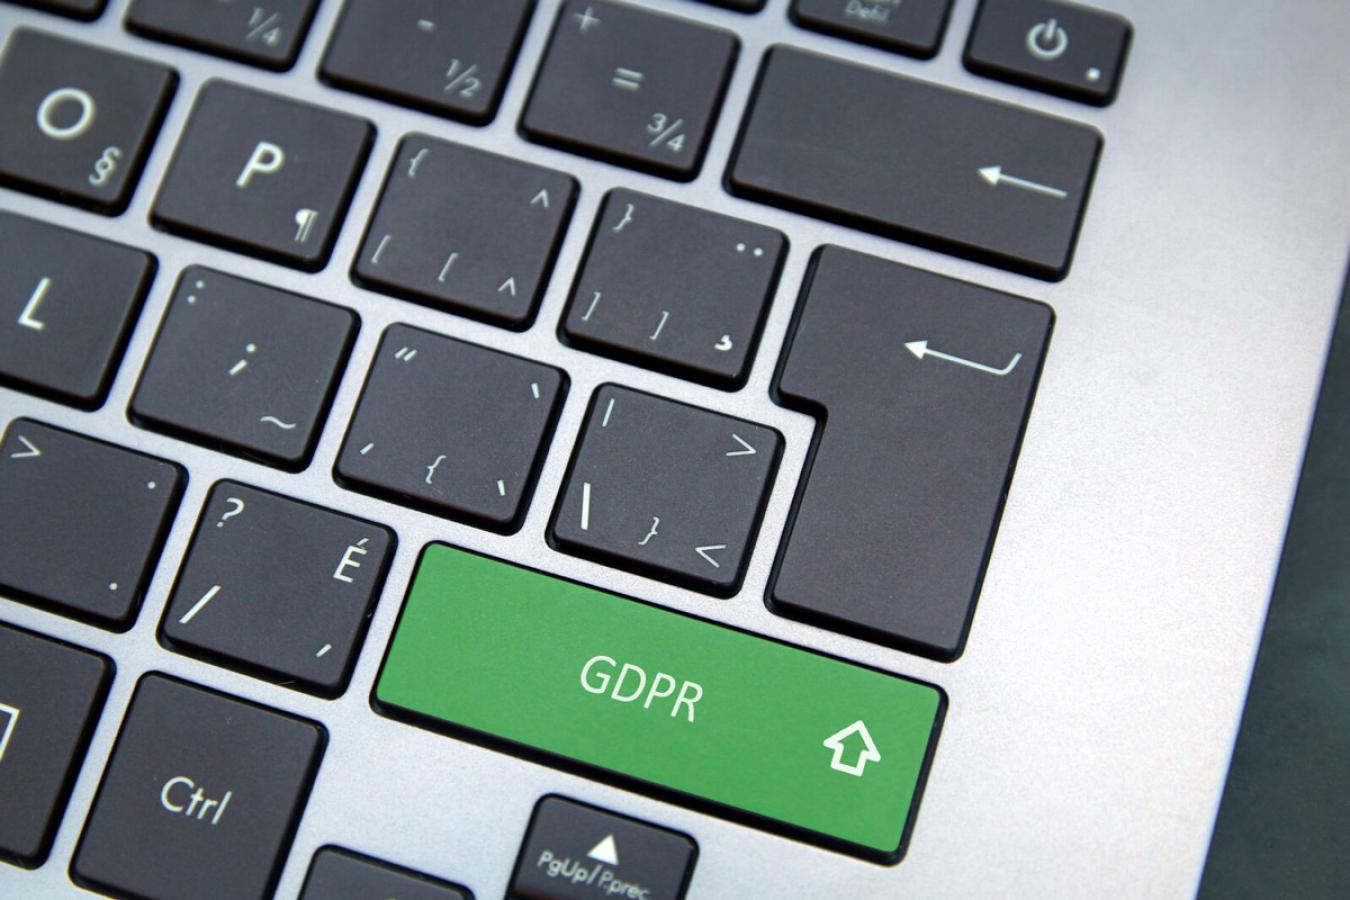 GDPR Data Laws